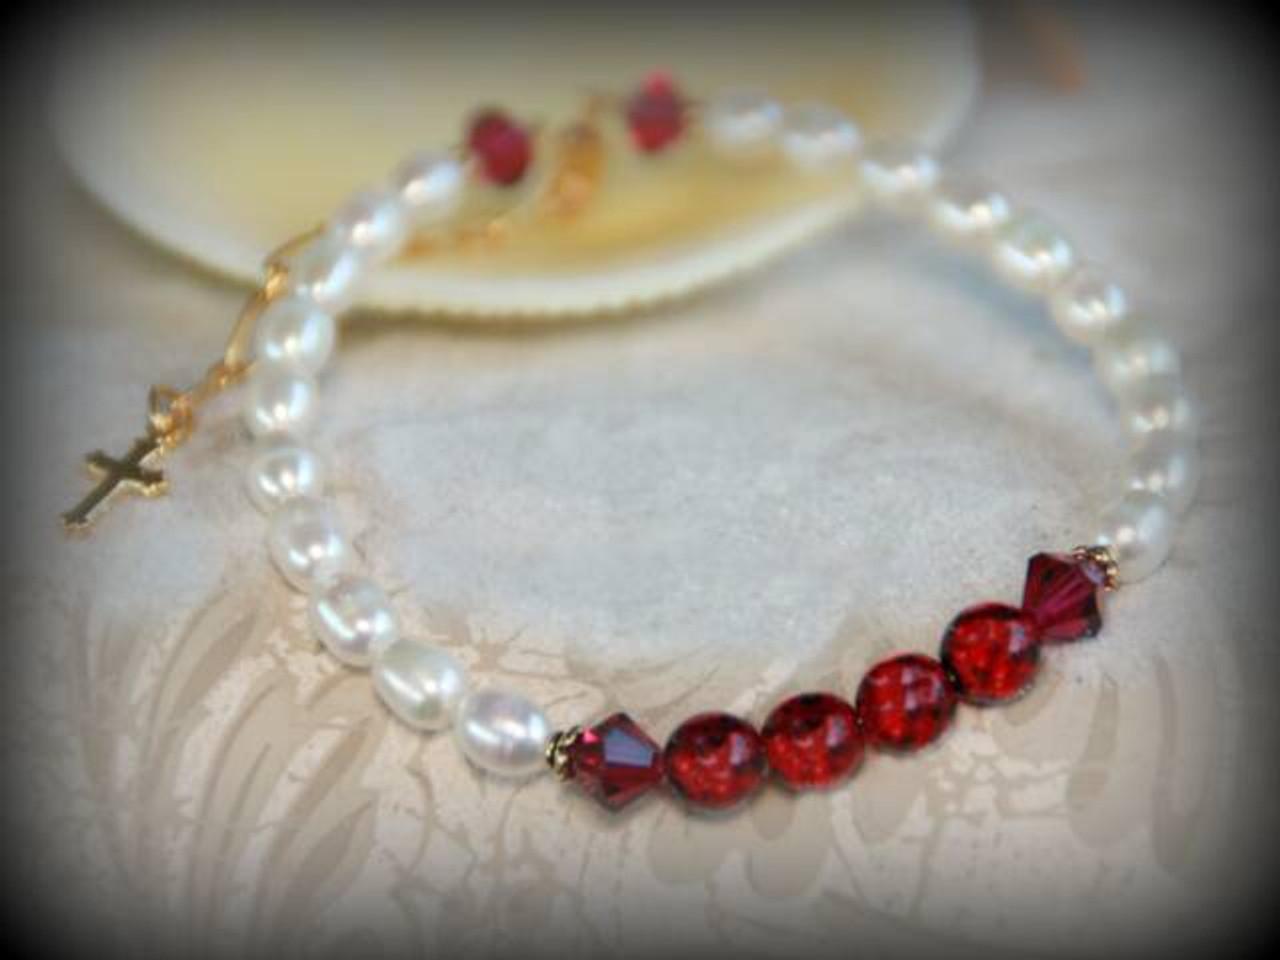 IN-343 Virtuous Woman Bracelet